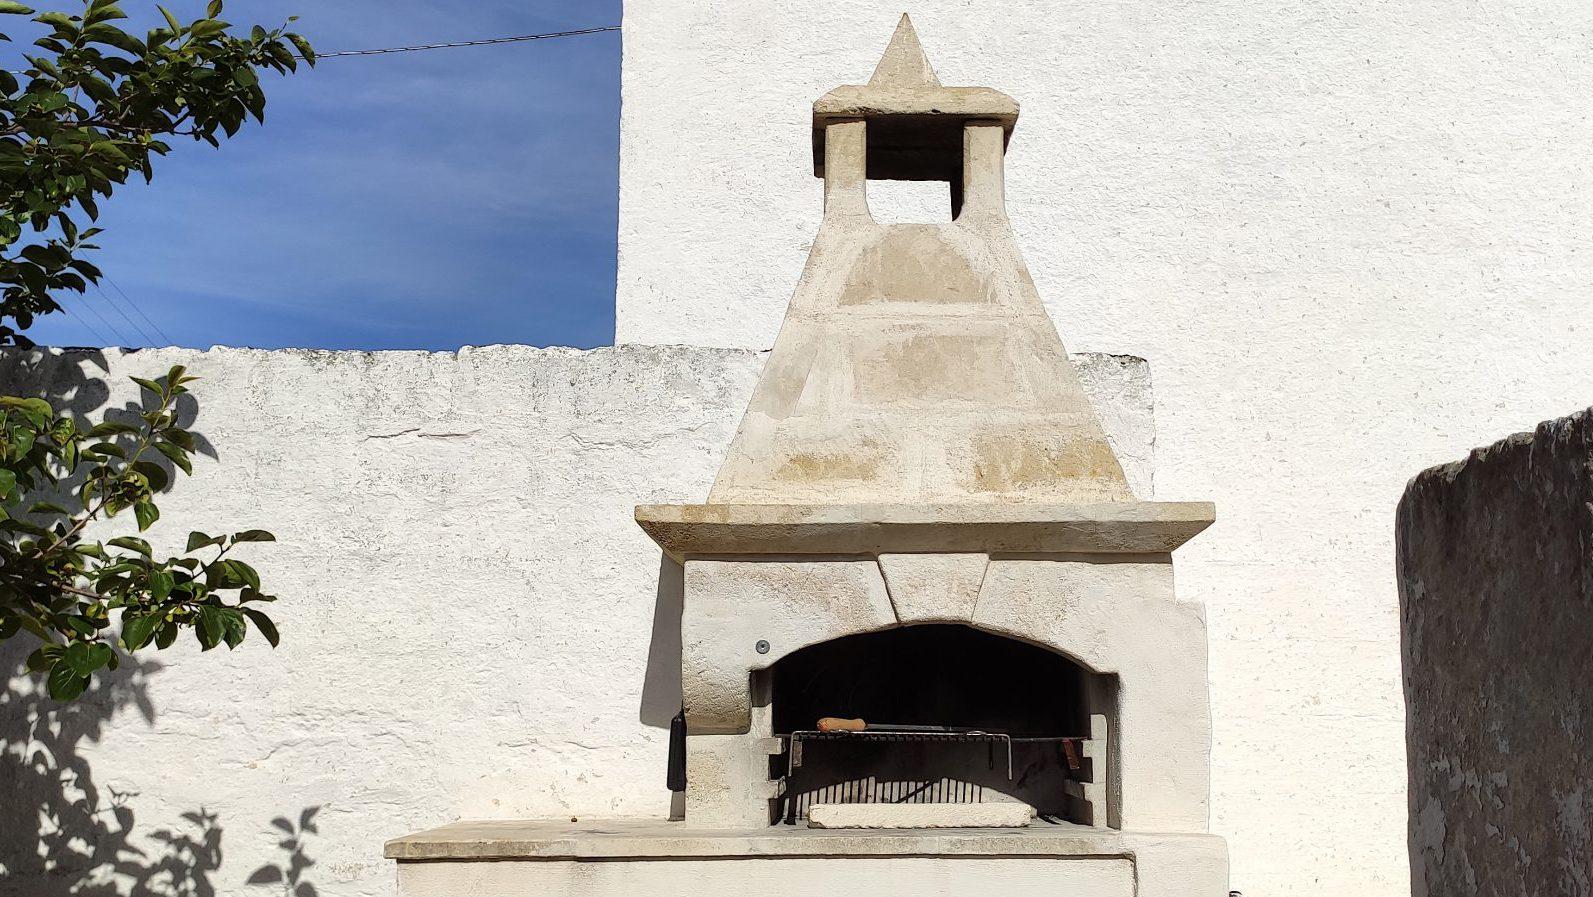 Stone BBQ at Masseria Bellavista Ostuni Vacation holiday rental villa in Puglia with pool and seaview